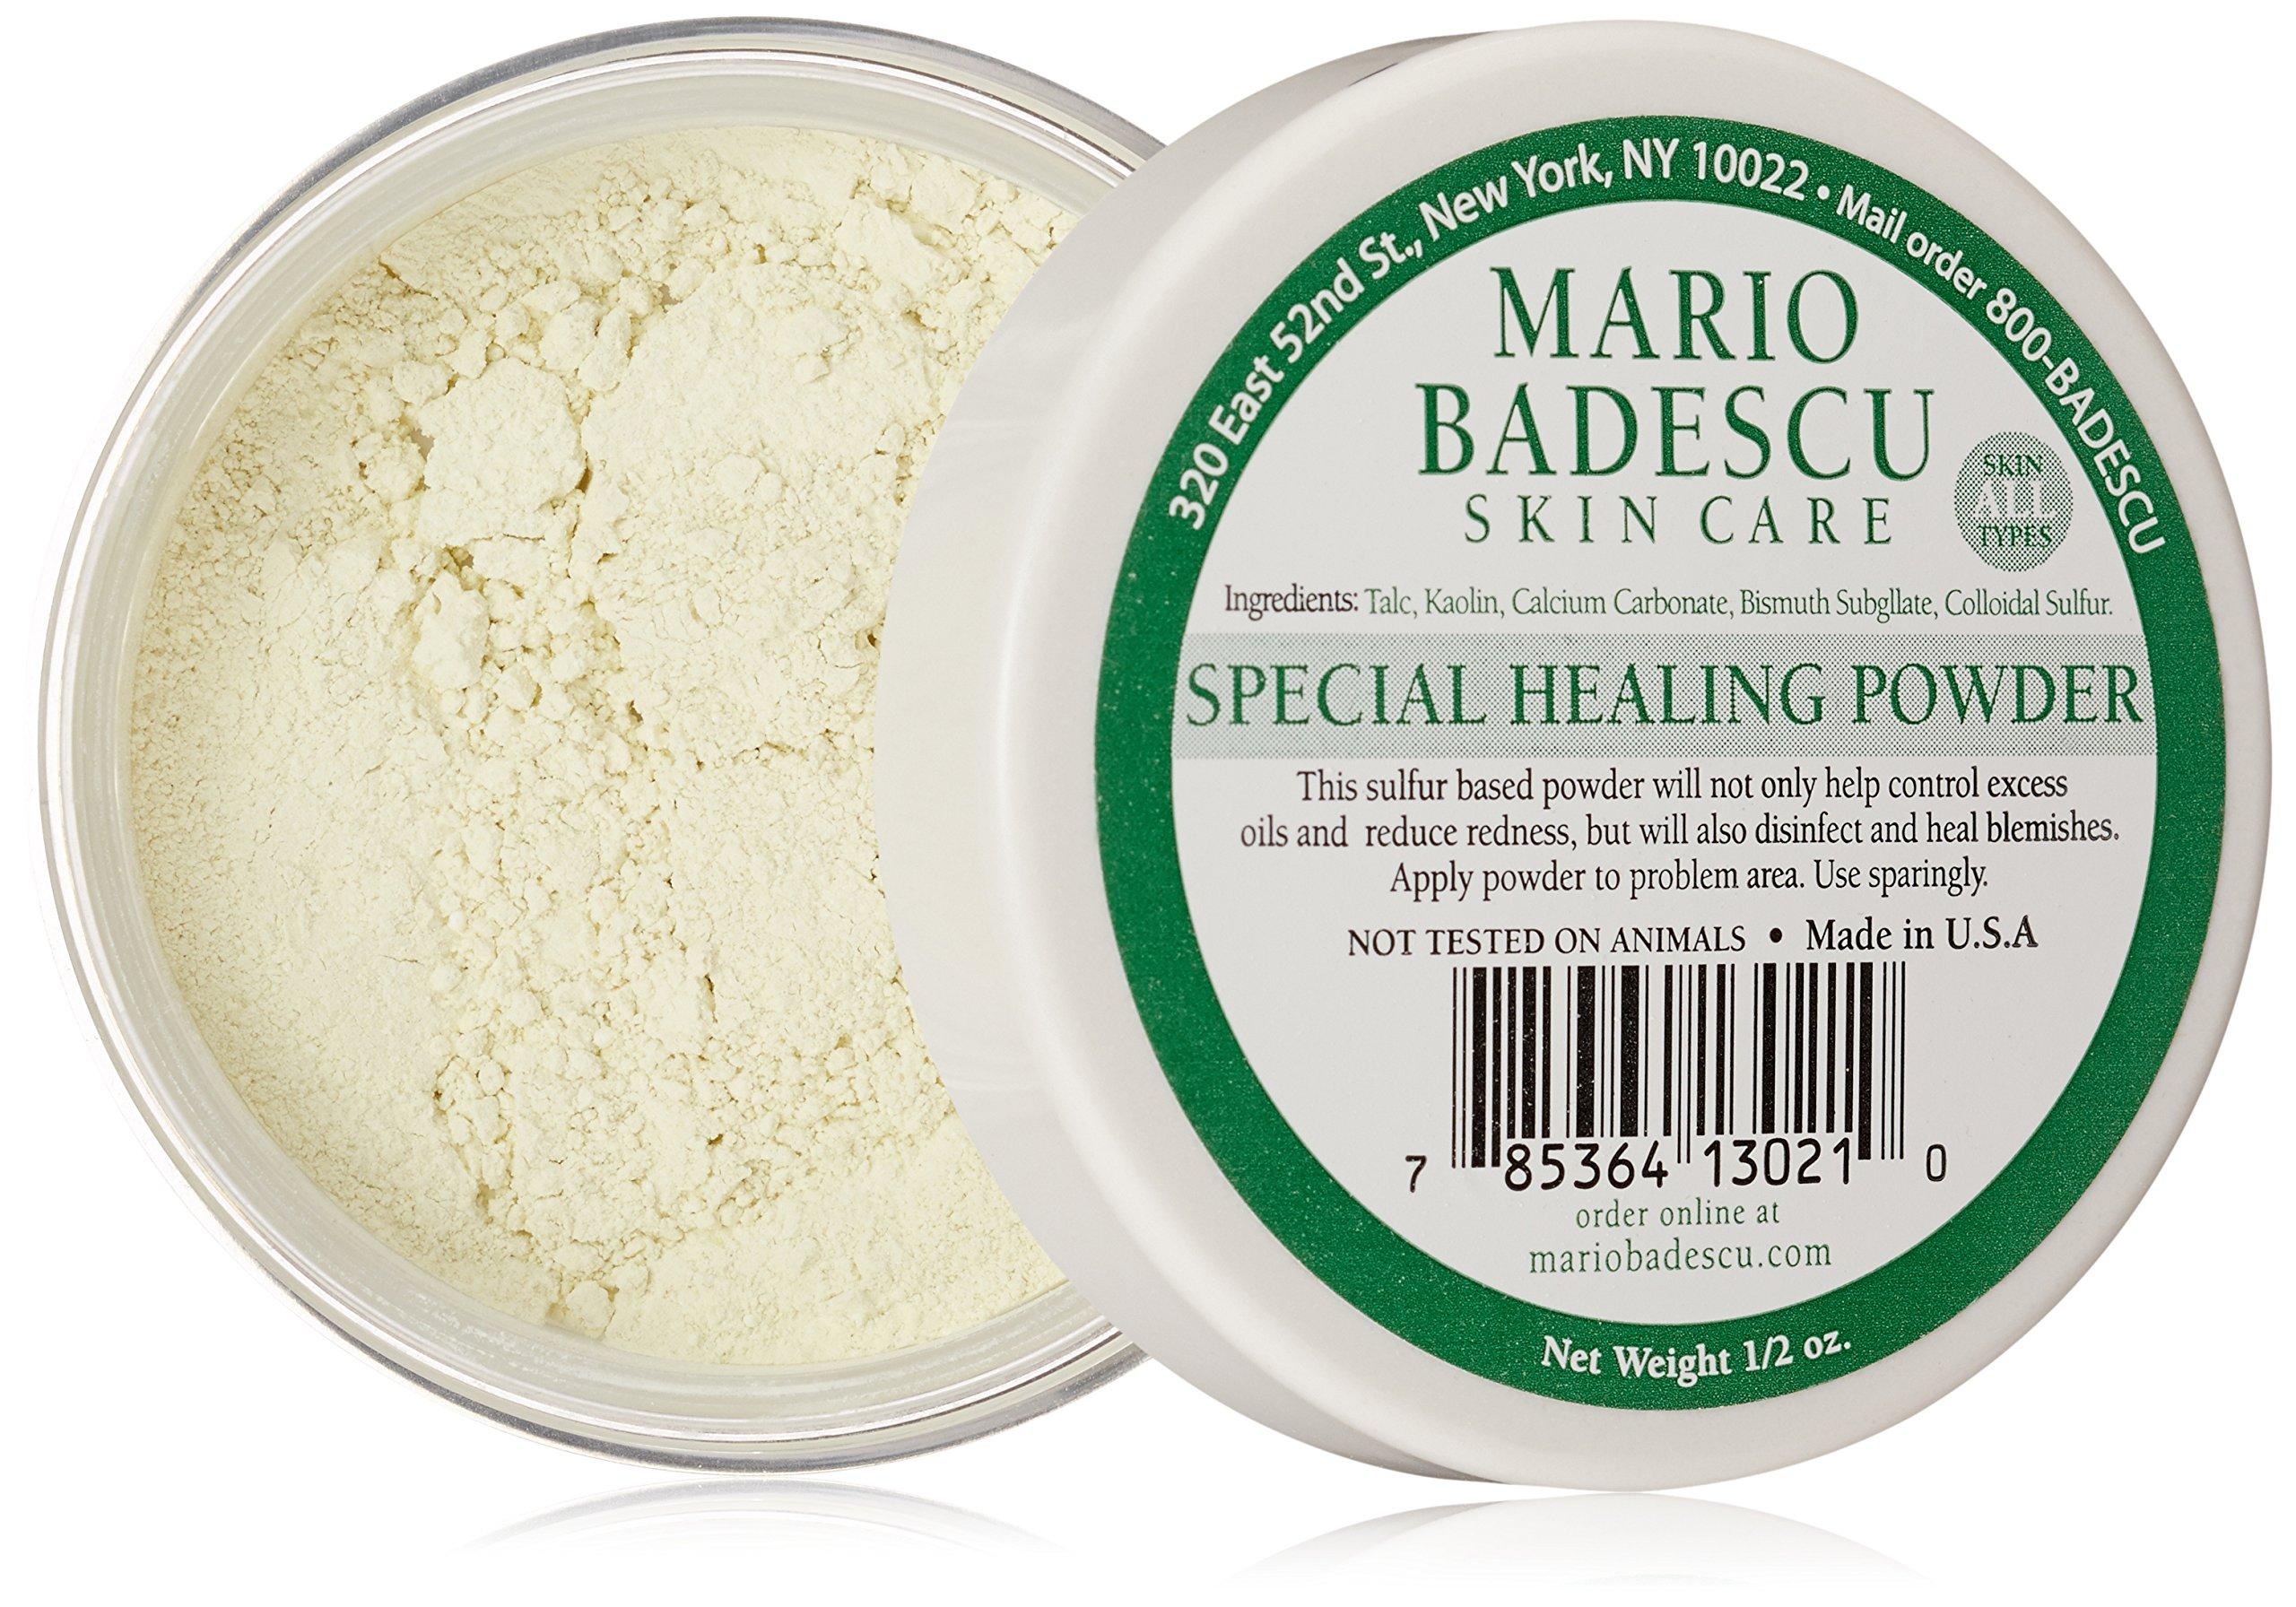 Mario Badescu Special Healing Powder, 0.5 oz.